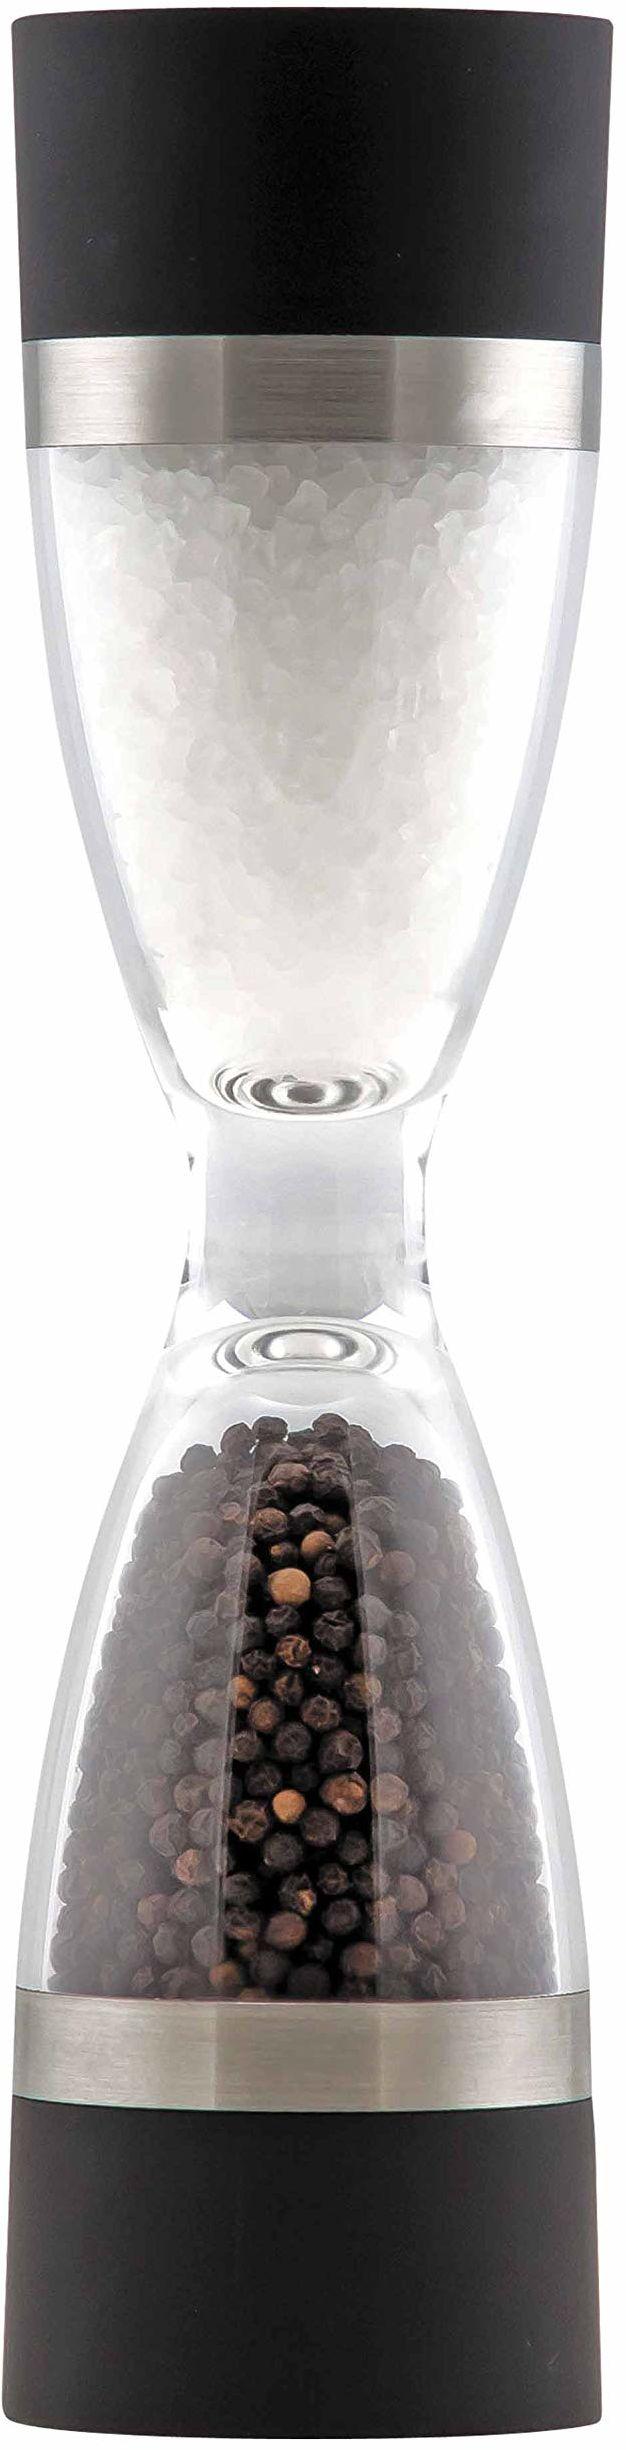 Lacor 62816 podwójny shaker, 30 x 6 x 18 cm, czarny